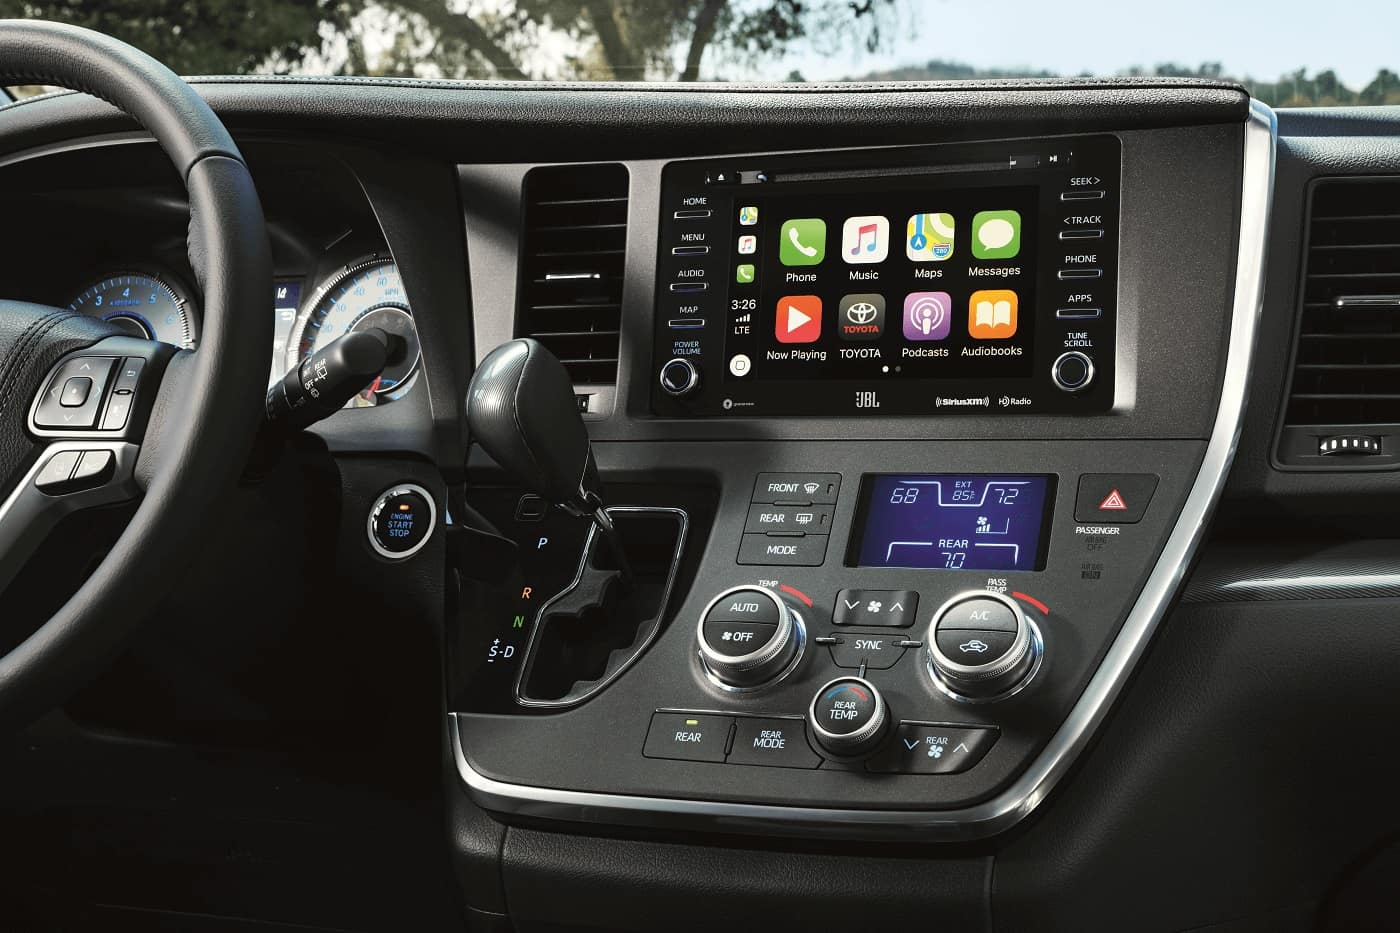 2020 Toyota Sienna Infotainment